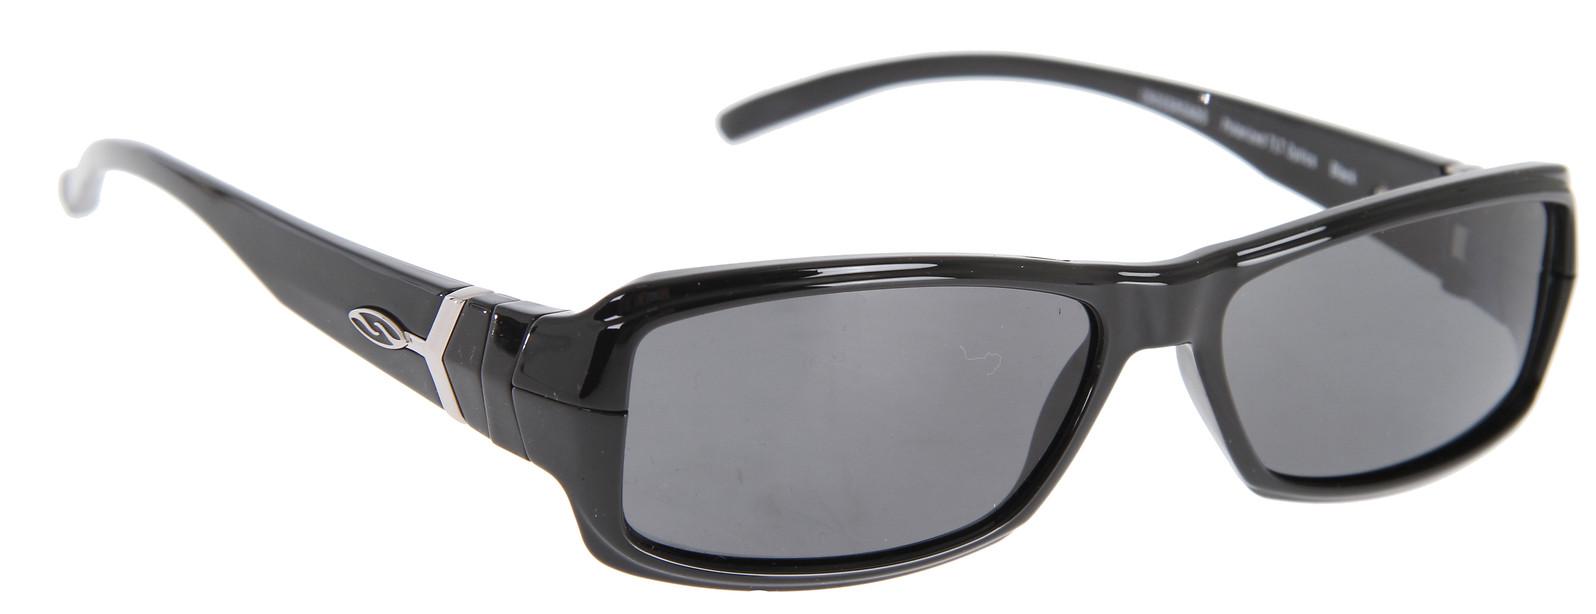 Smith Crossroad Interlock Sunglasses Black/Grey Polarized Lens  smith-crossroad-interlock-sngls-gry-blk-plzd-09.jpg